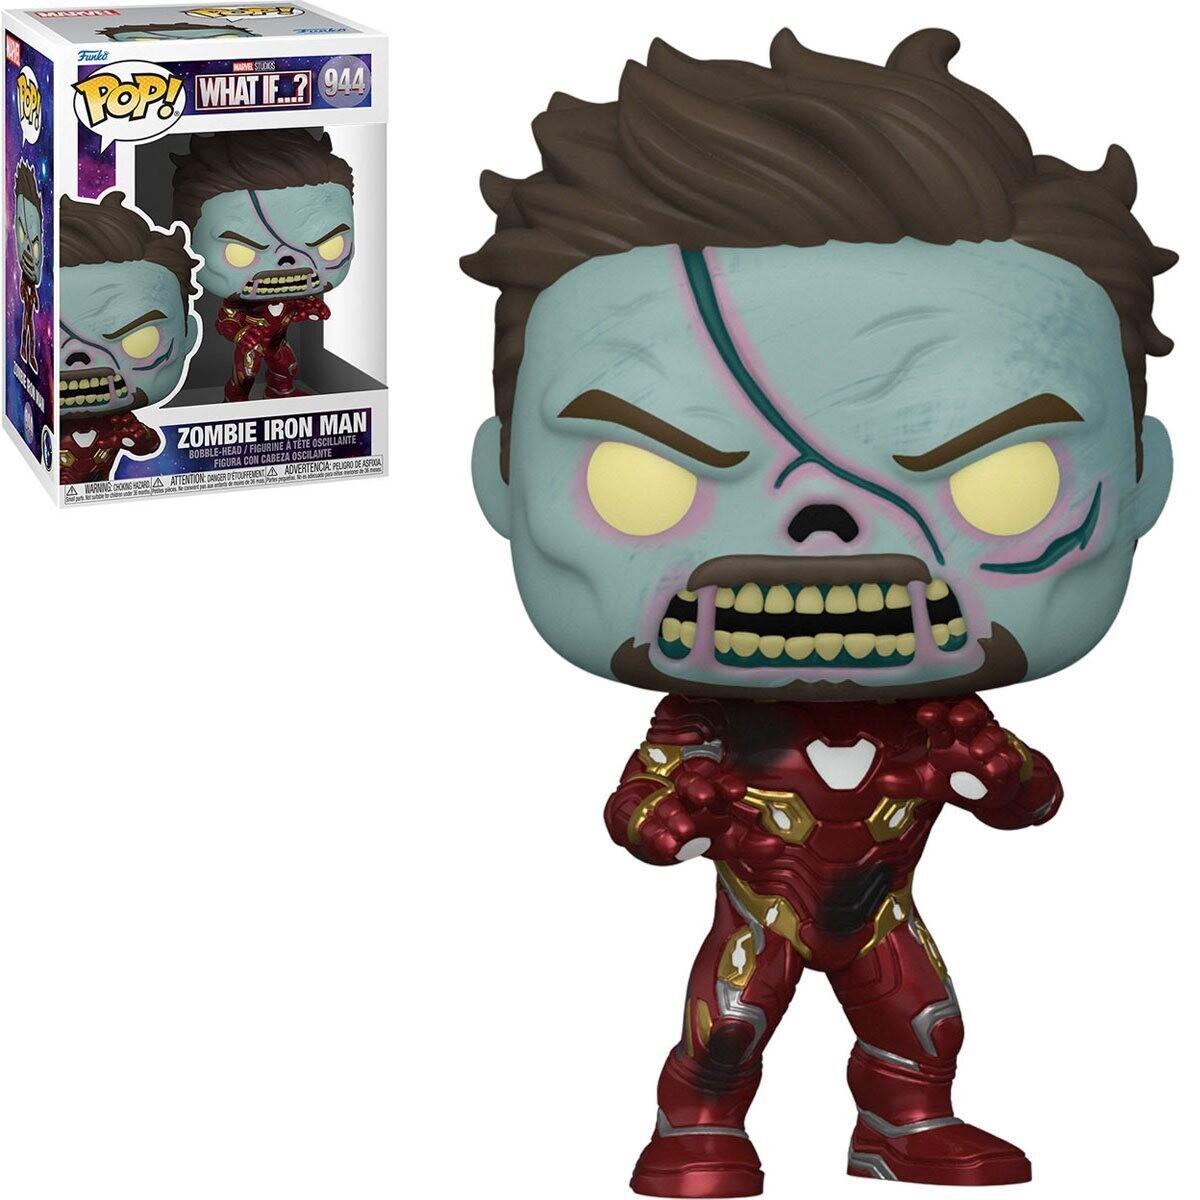 PRE-ORDER Funko What If Zombie Iron Man Pop! Vinyl Figure